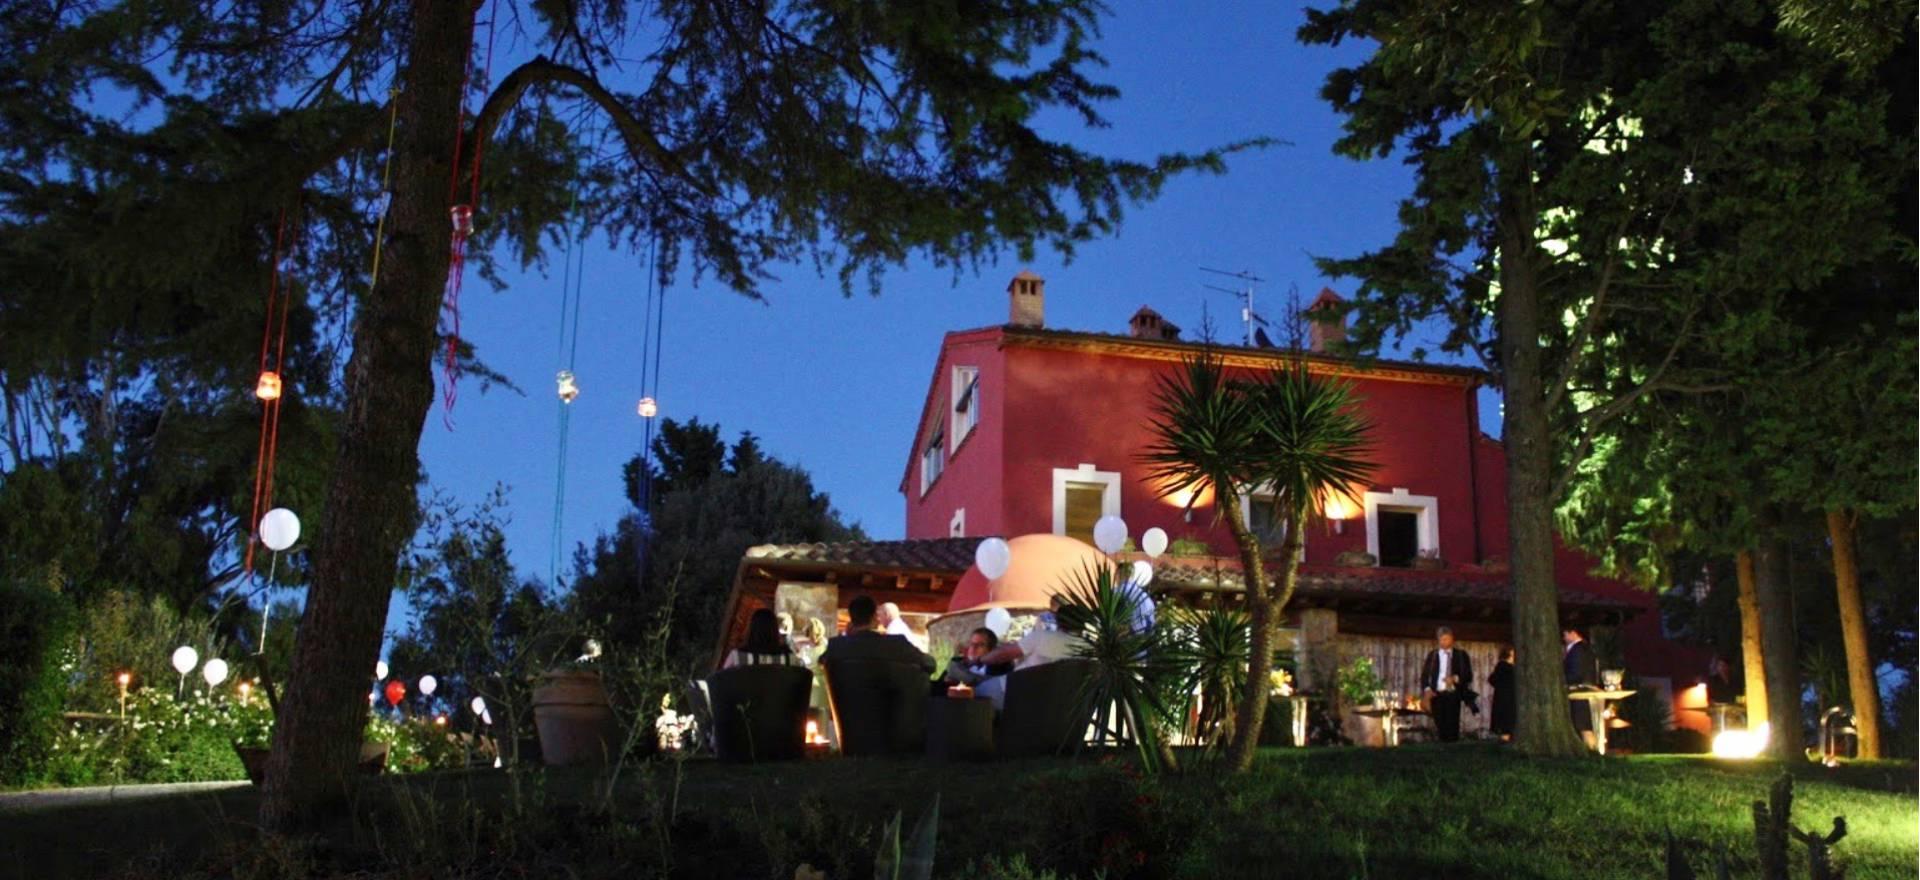 Mooie agriturismo in Zuid Toscane met zeezicht